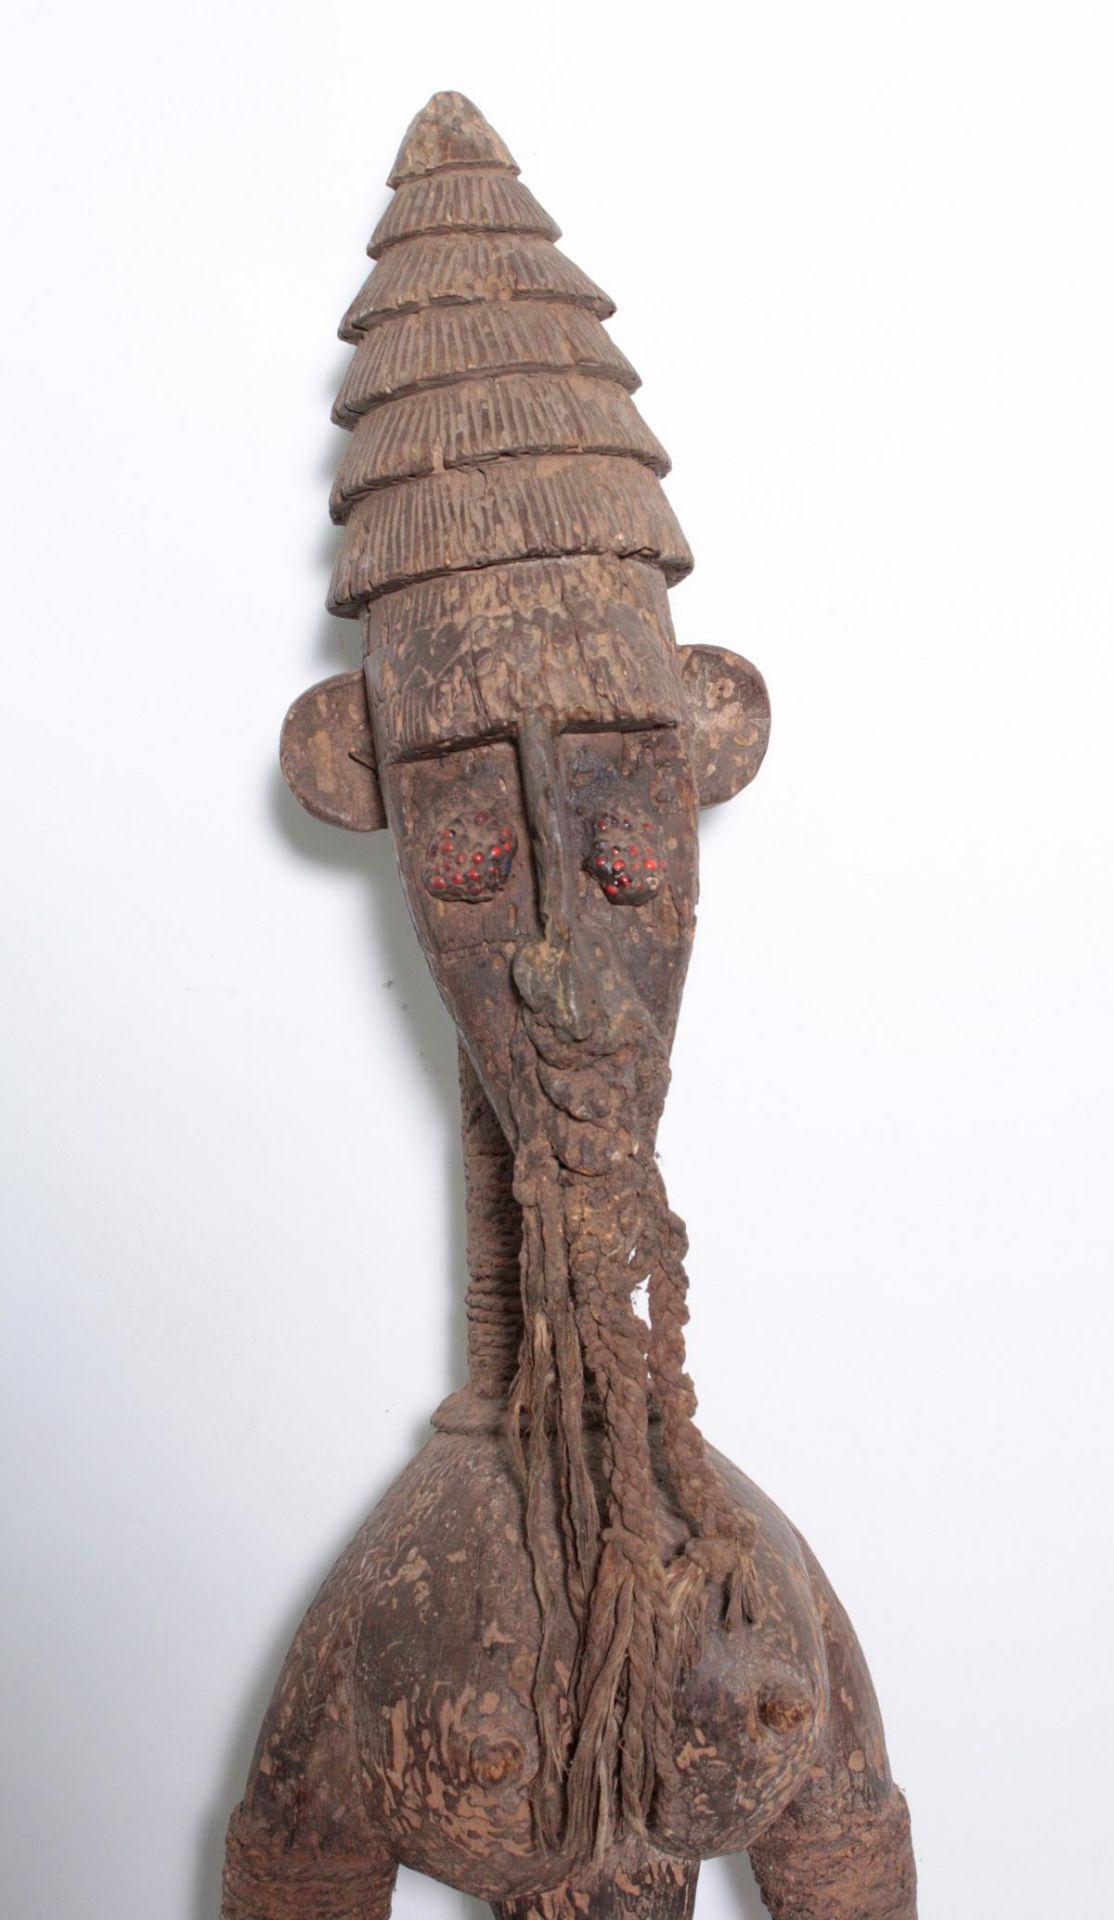 Ältere Große Figur, Dogon oder Bambara, Mali - Bild 2 aus 16